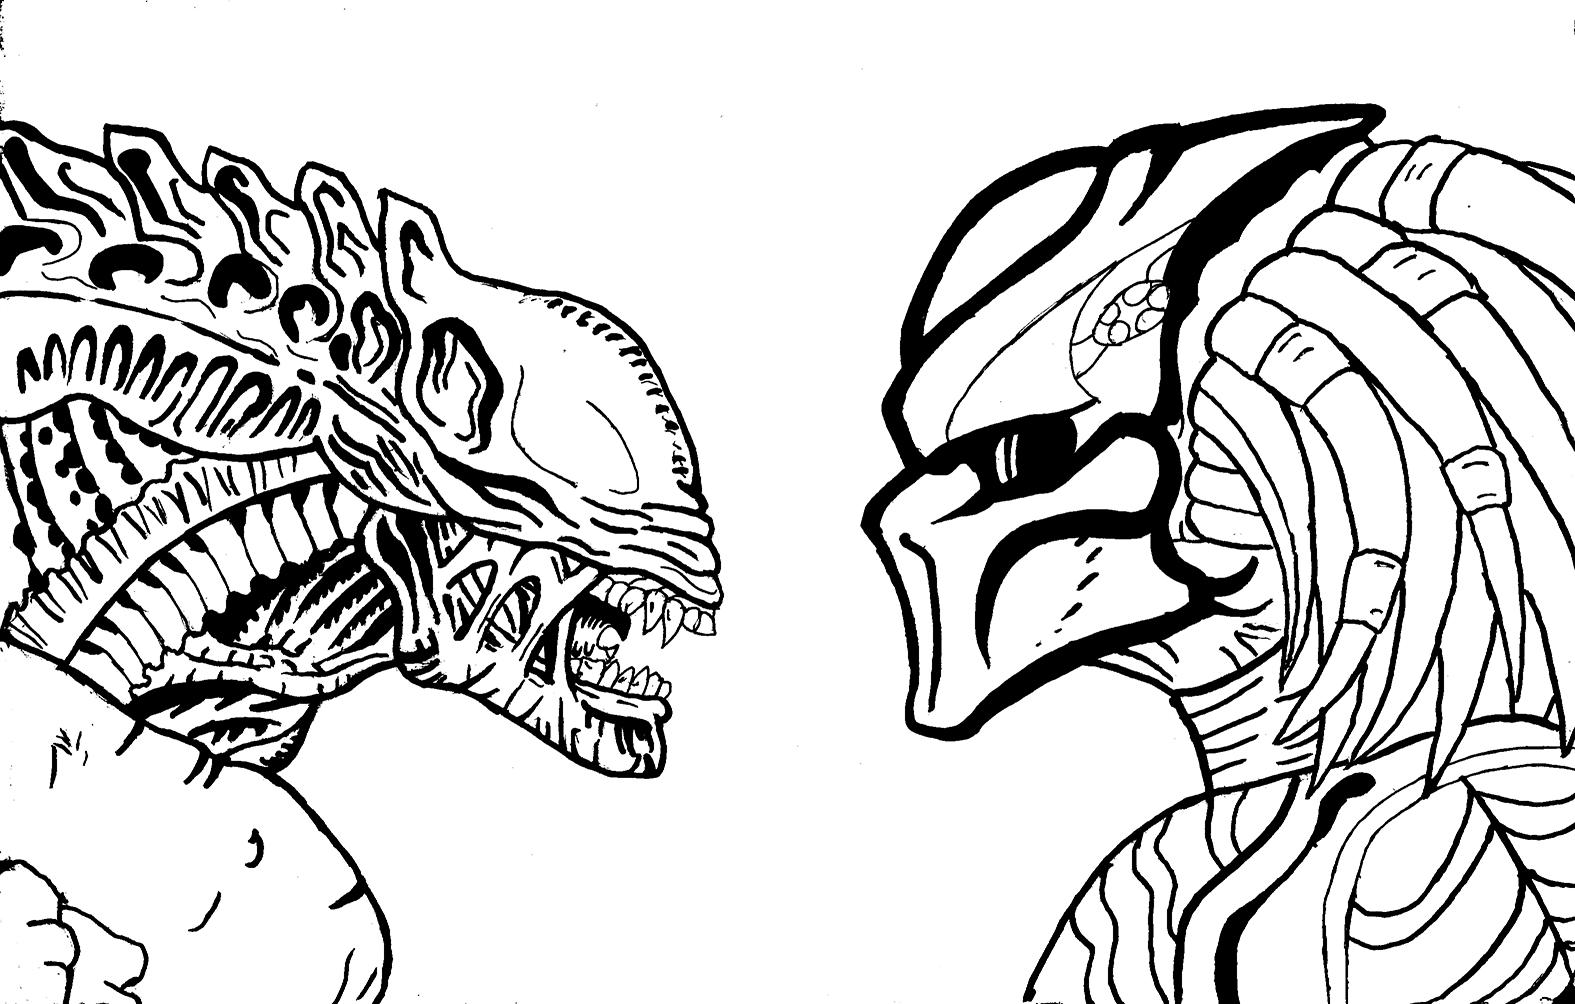 Drawn predator alien vs predator Predator DeviantArt Alien VS dragokaiju2000